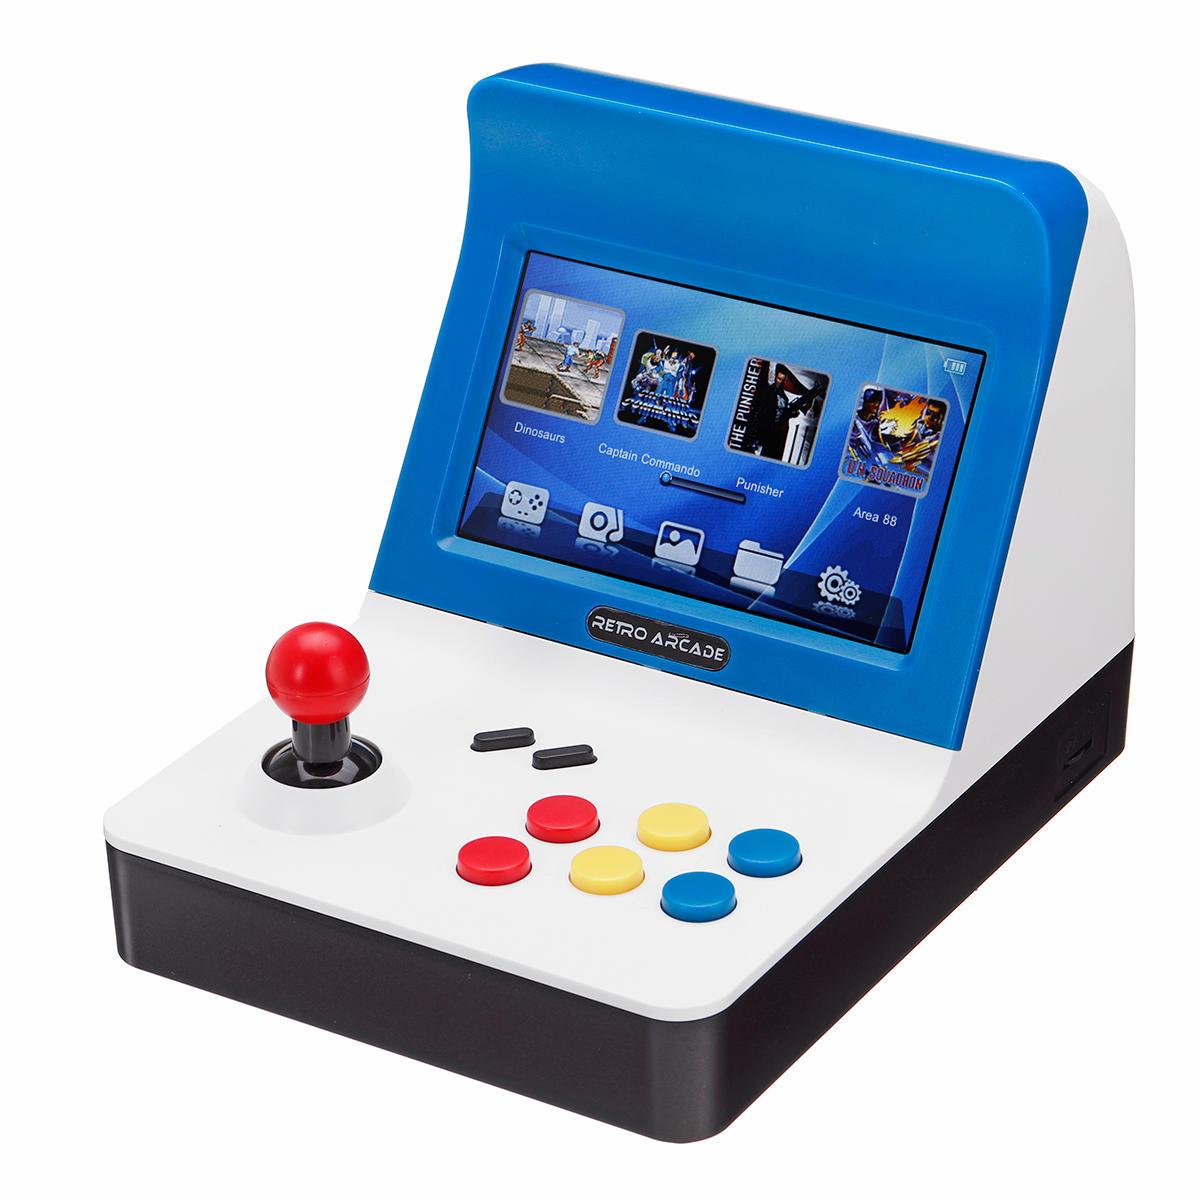 Konsola NEOGEO Retro Arcade za $65.62 / ~256zł